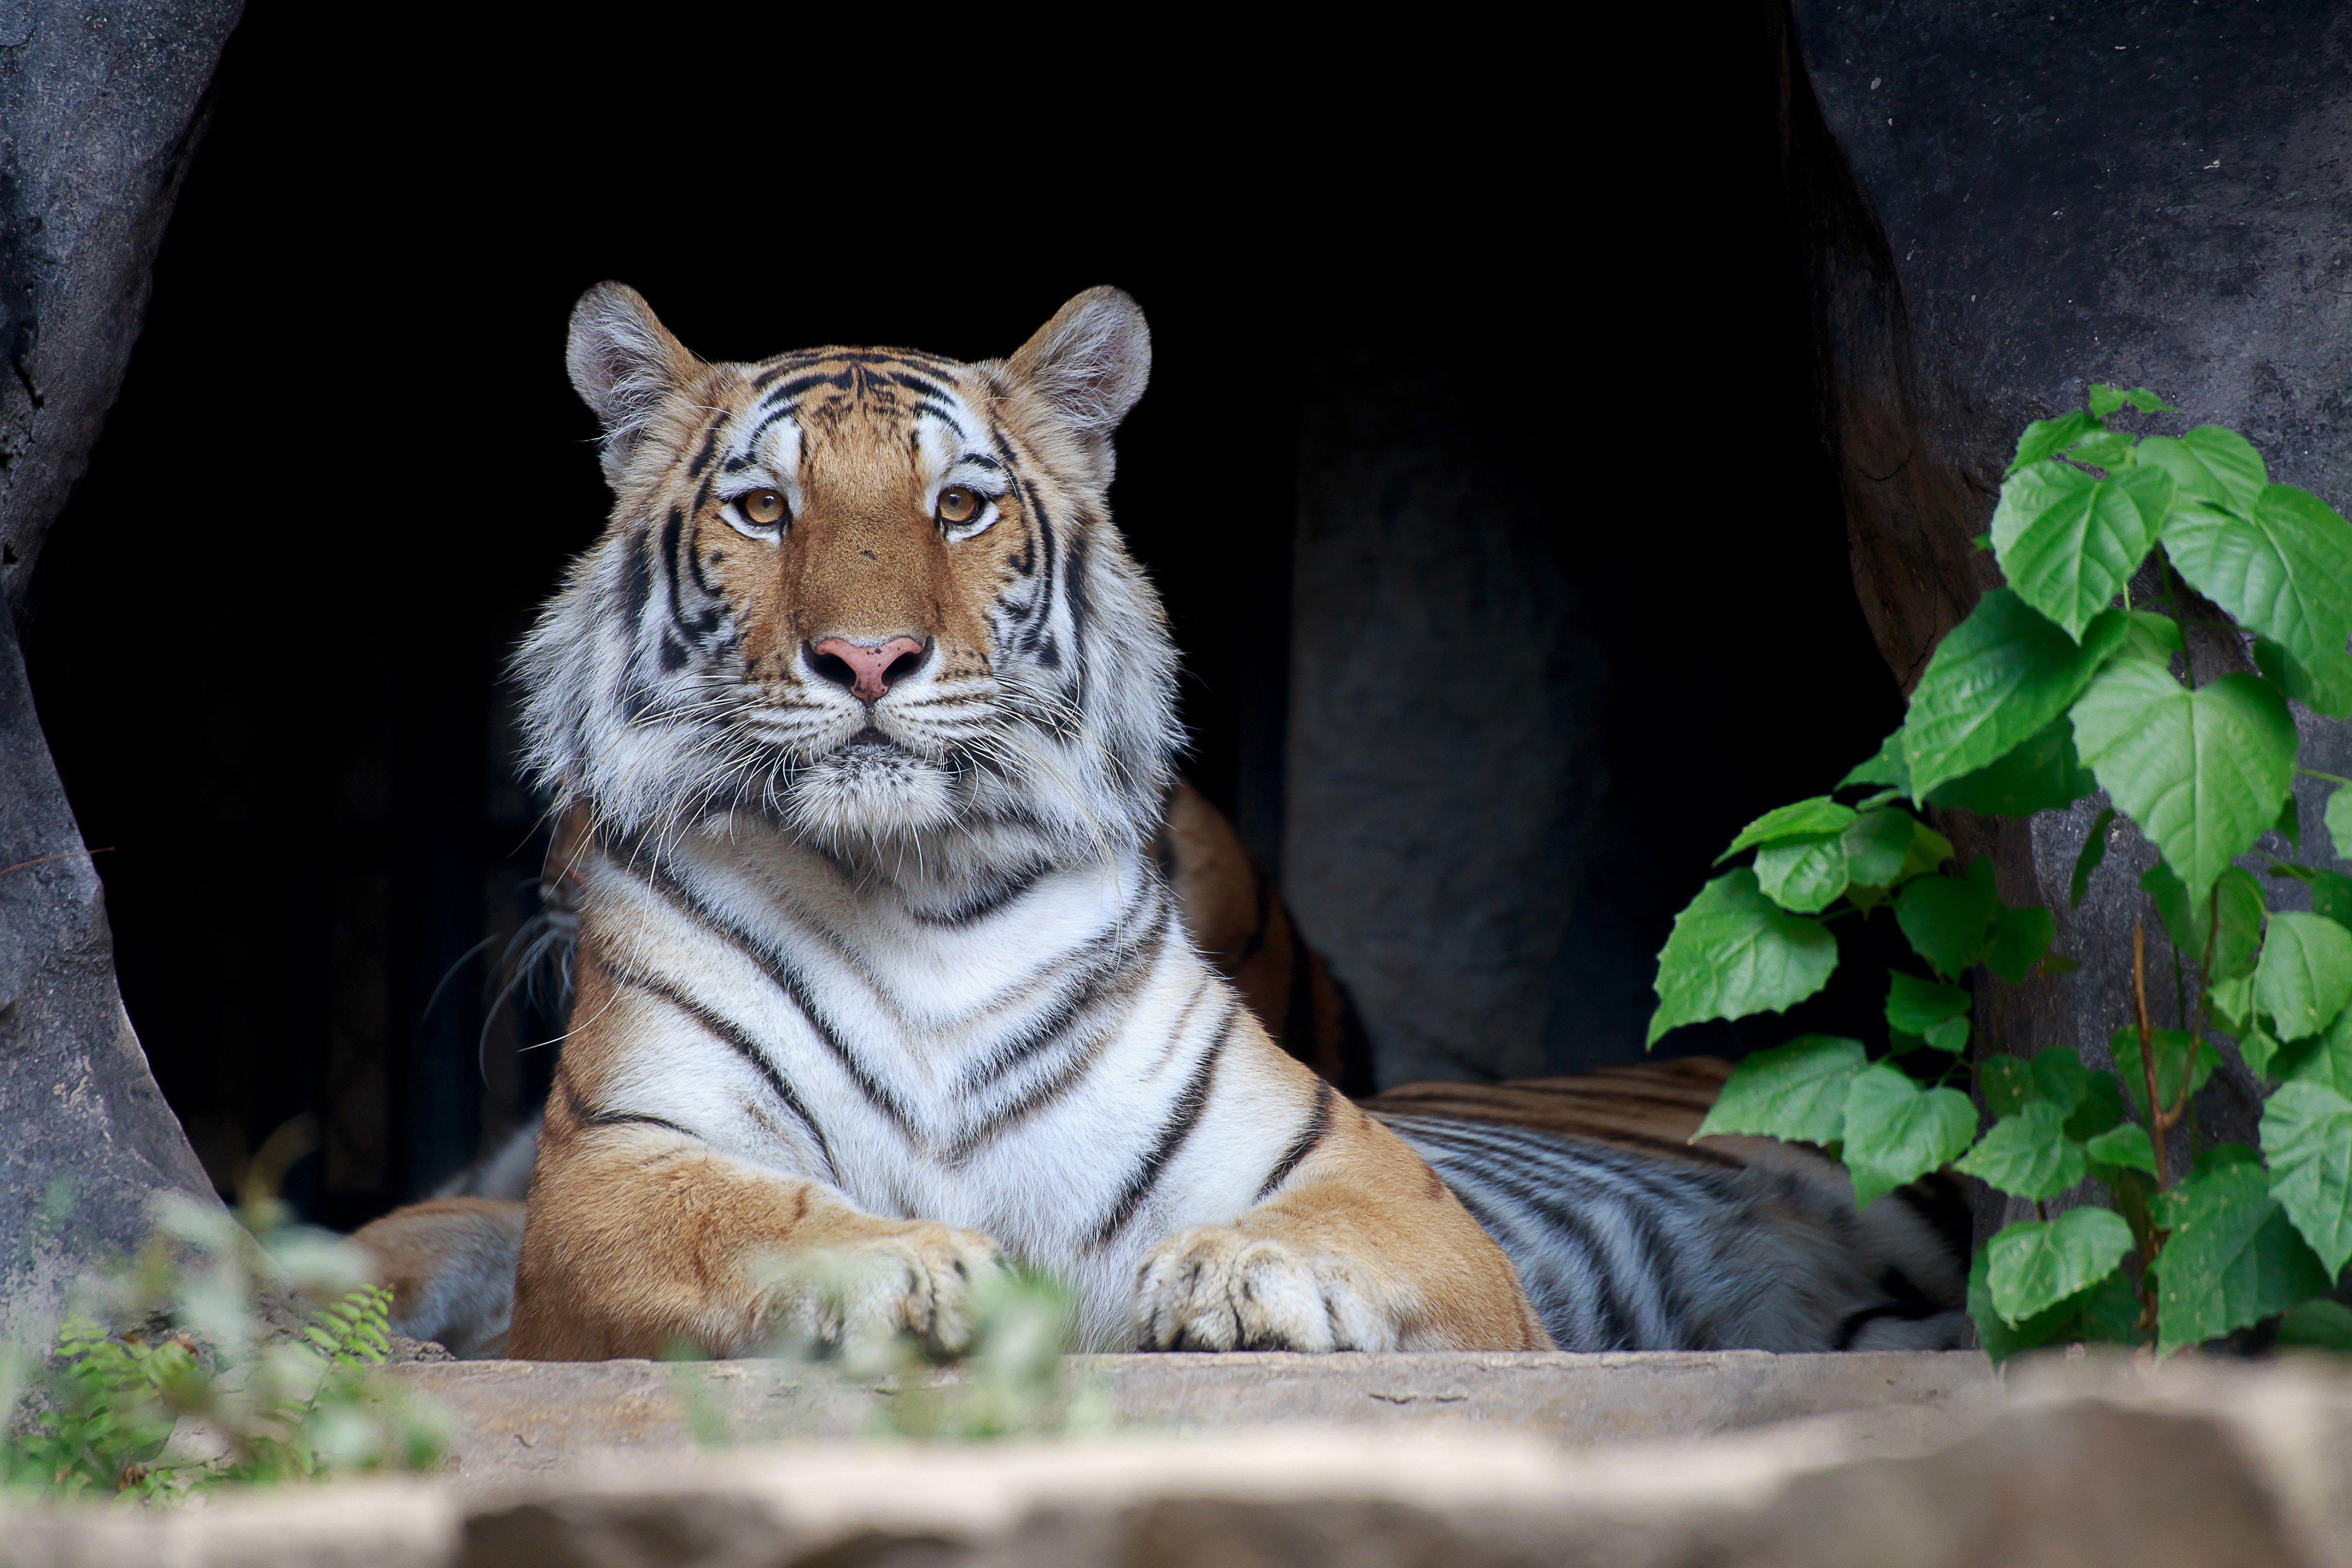 tiger - full hd background   hueputalo   pinterest   tiger wallpaper